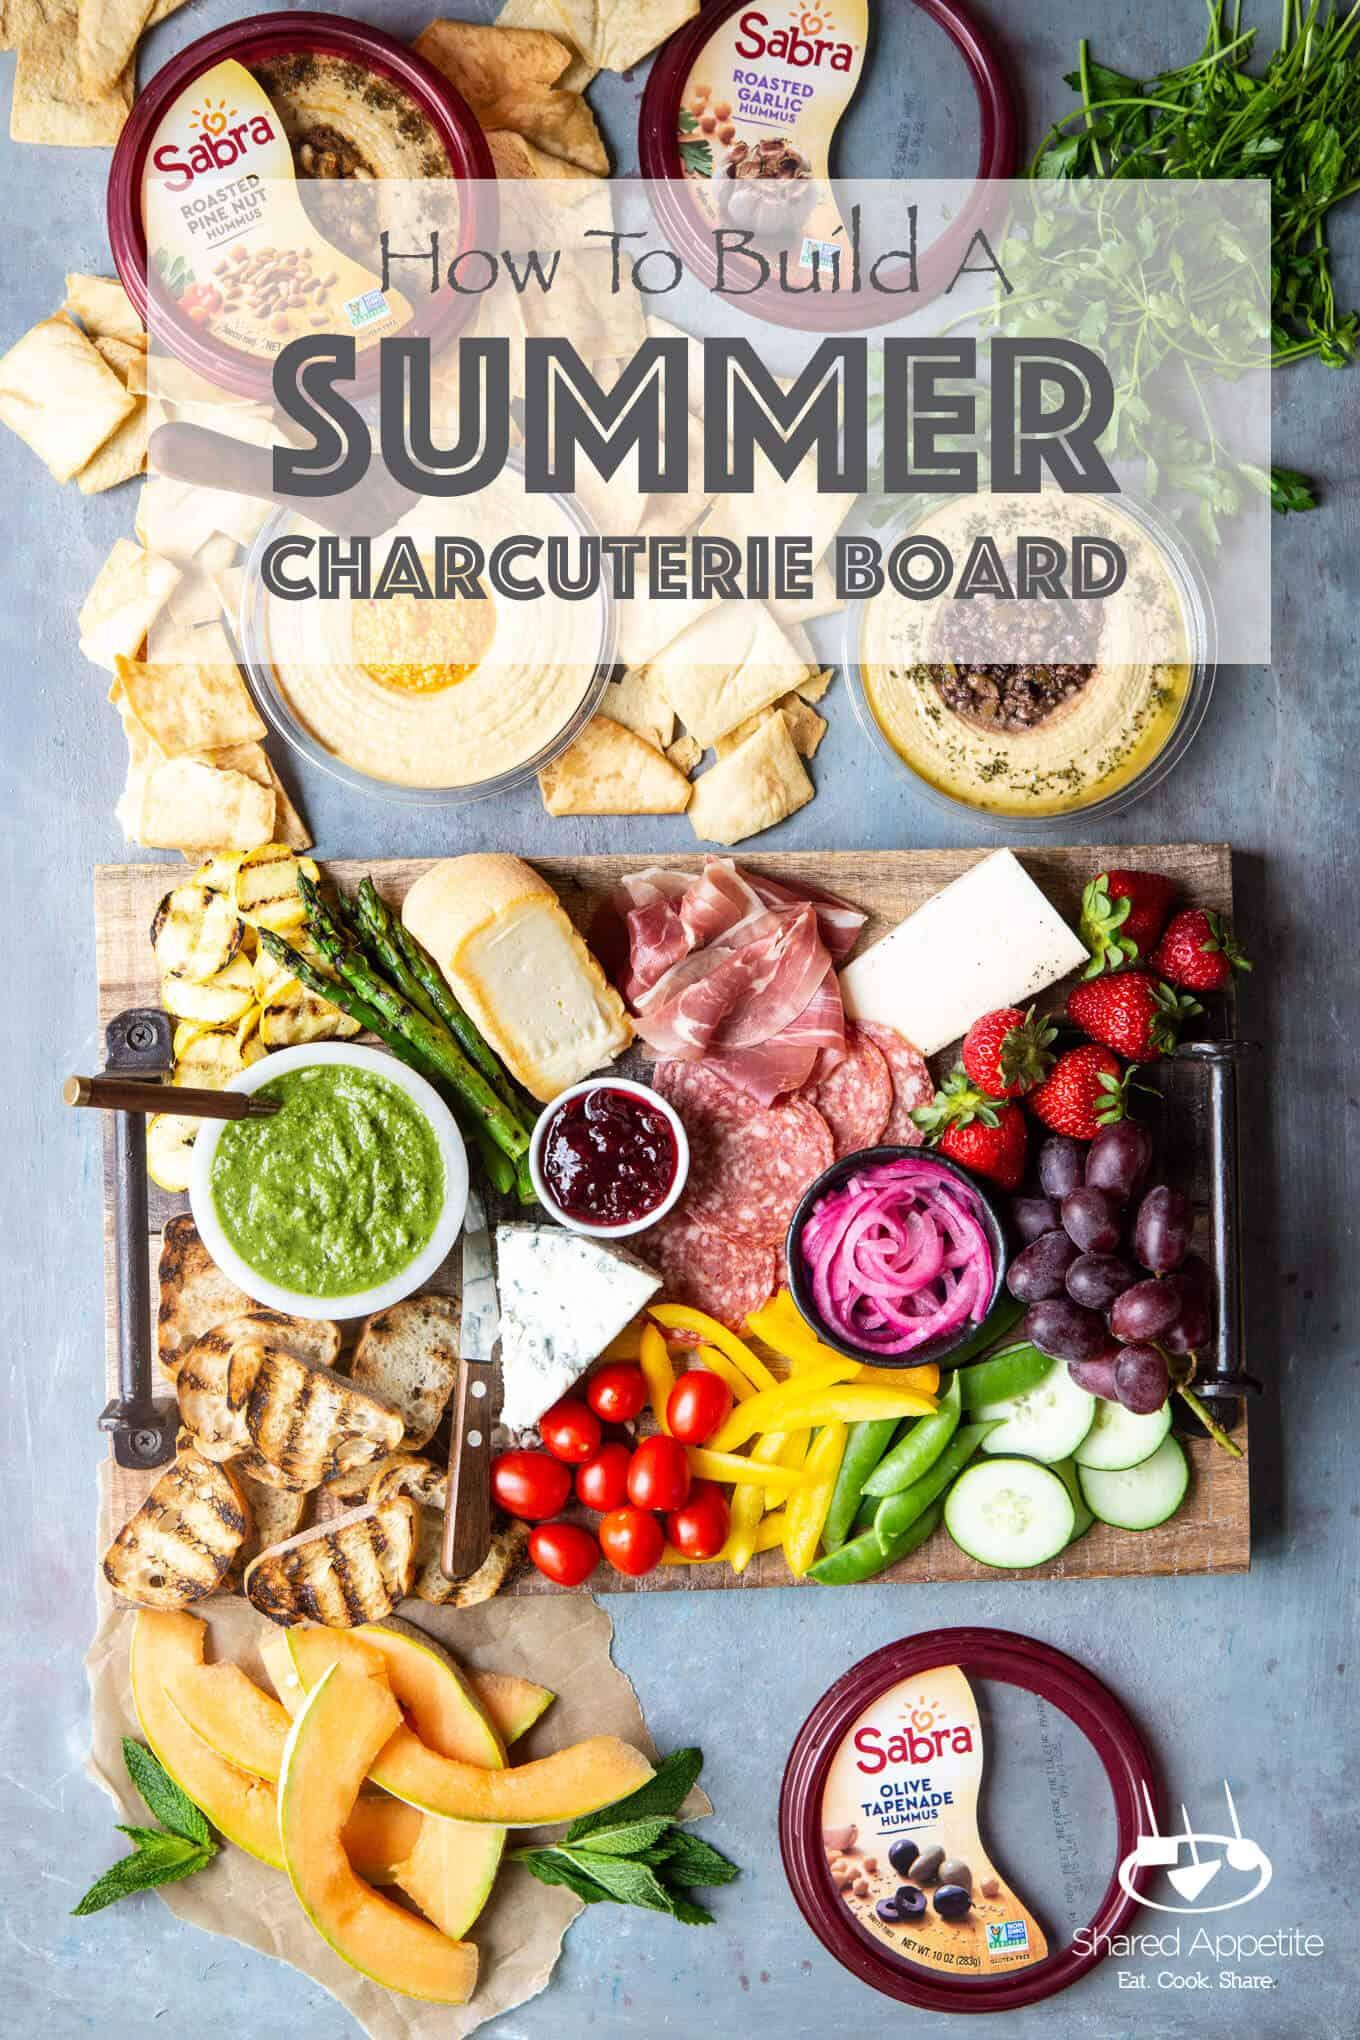 Sabra Hummus for How To Build A Summer Charcuterie Board | sharedappetite.com